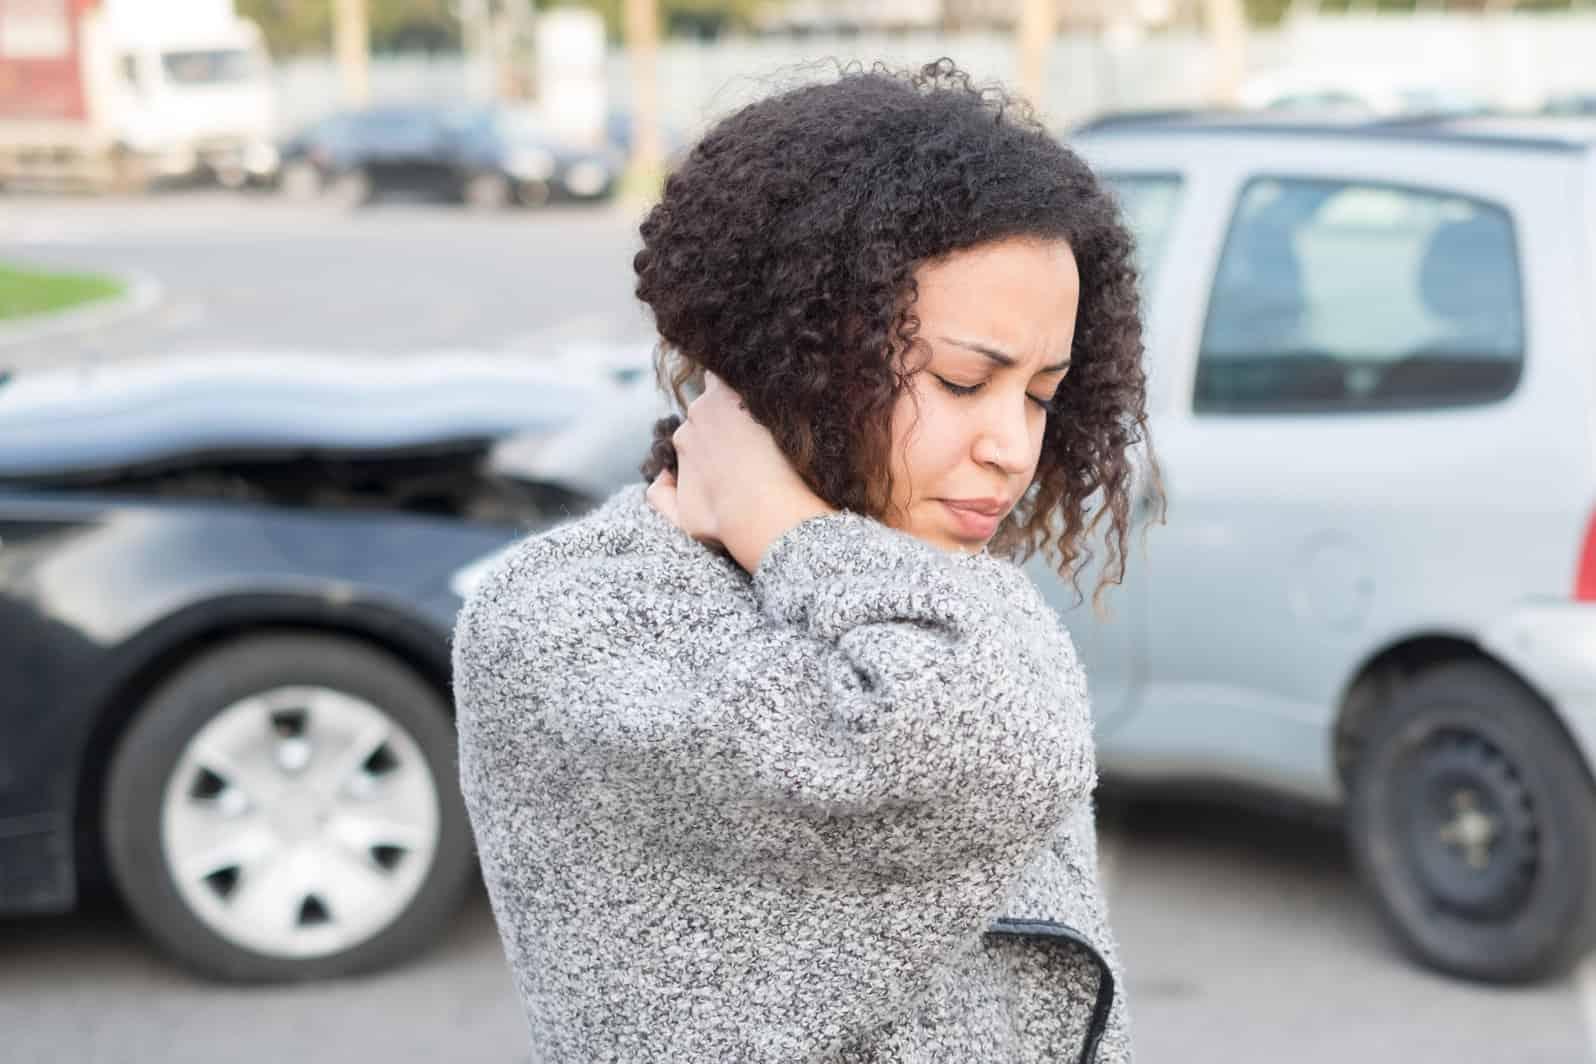 Injured woman feeling bad after having a car crash in Charlotte NC